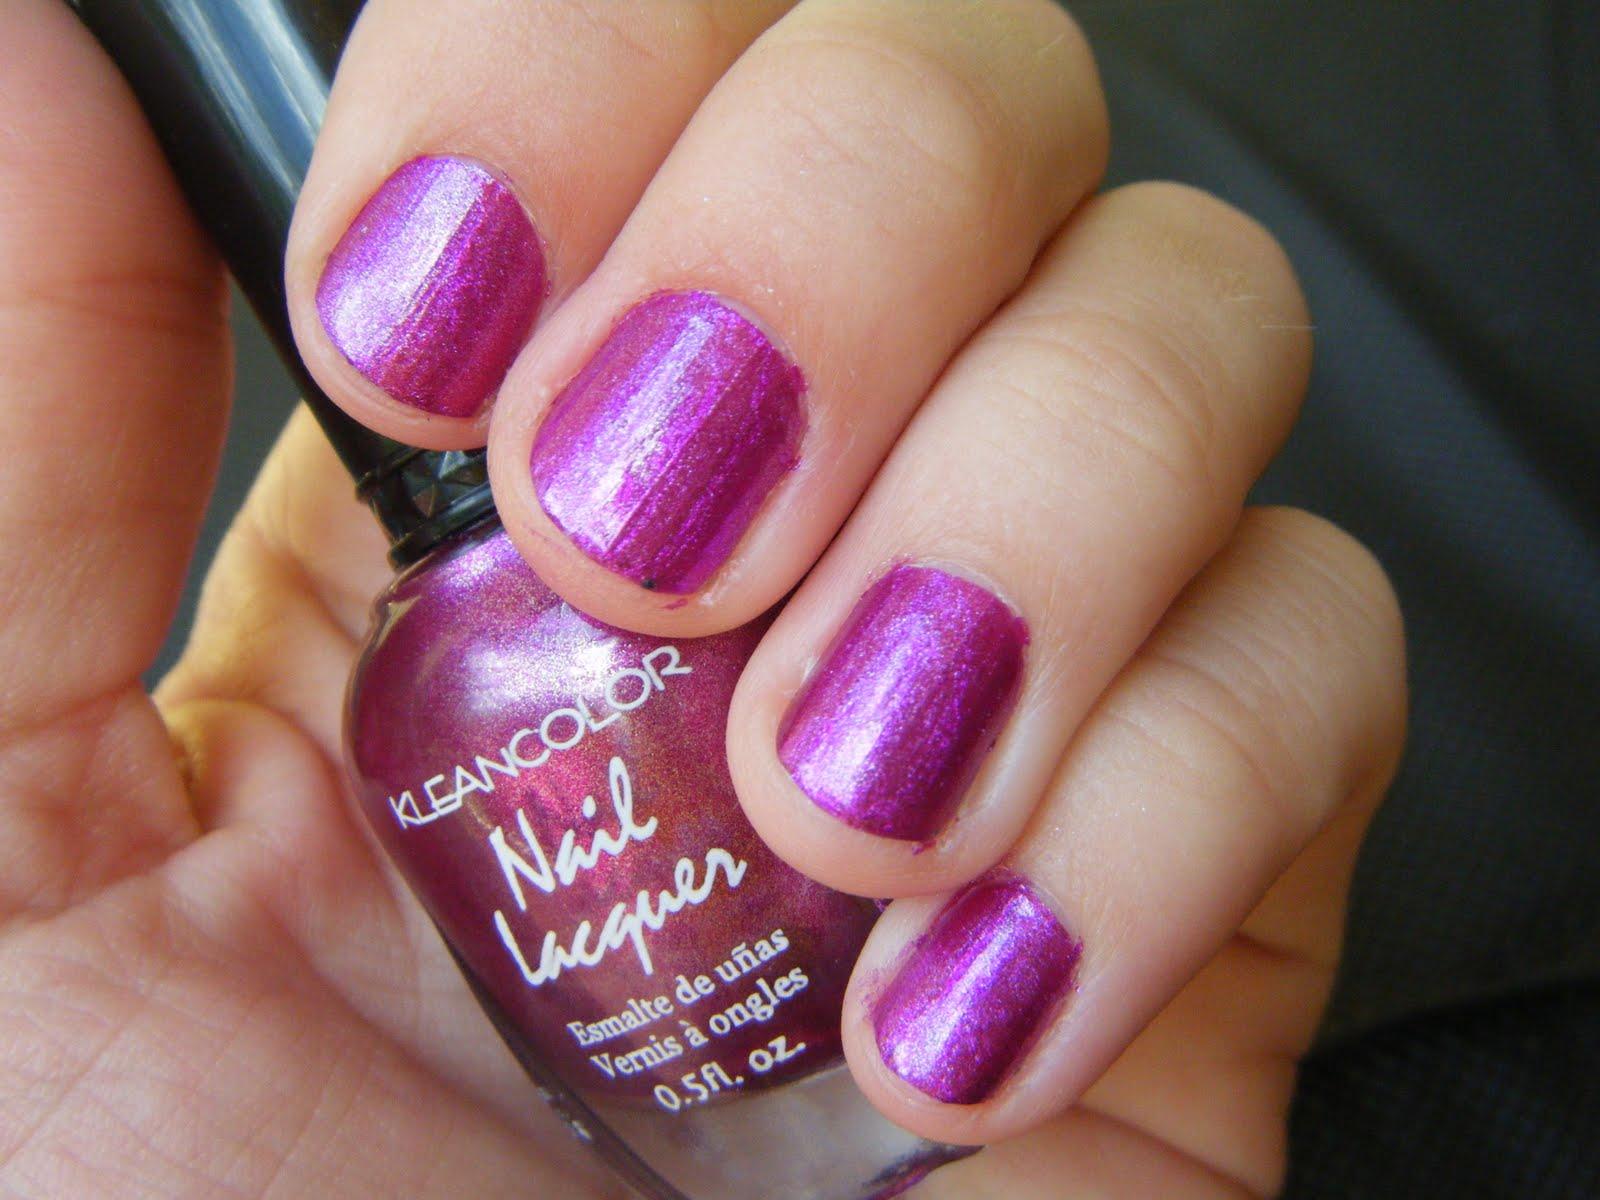 All Hail My Nails: Holo Fuschia Nails per the boyfriends request